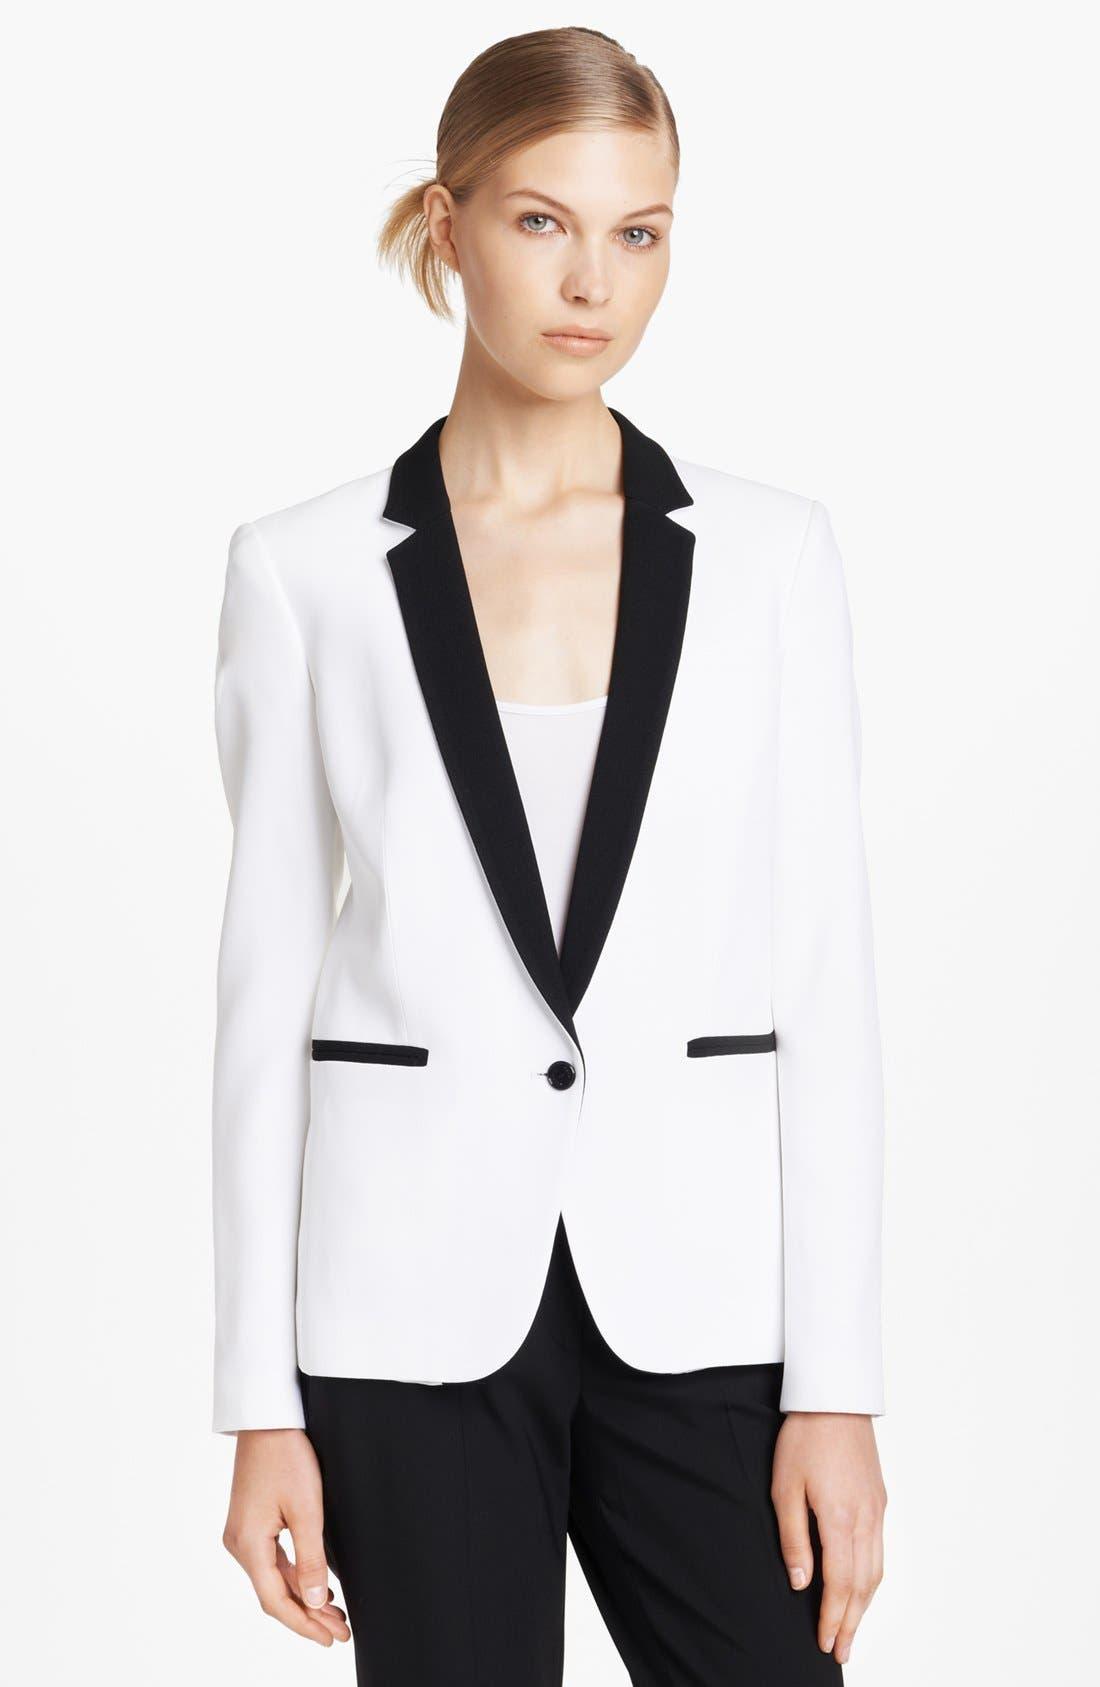 Alternate Image 1 Selected - Michael Kors Double Crepe Tuxedo Jacket